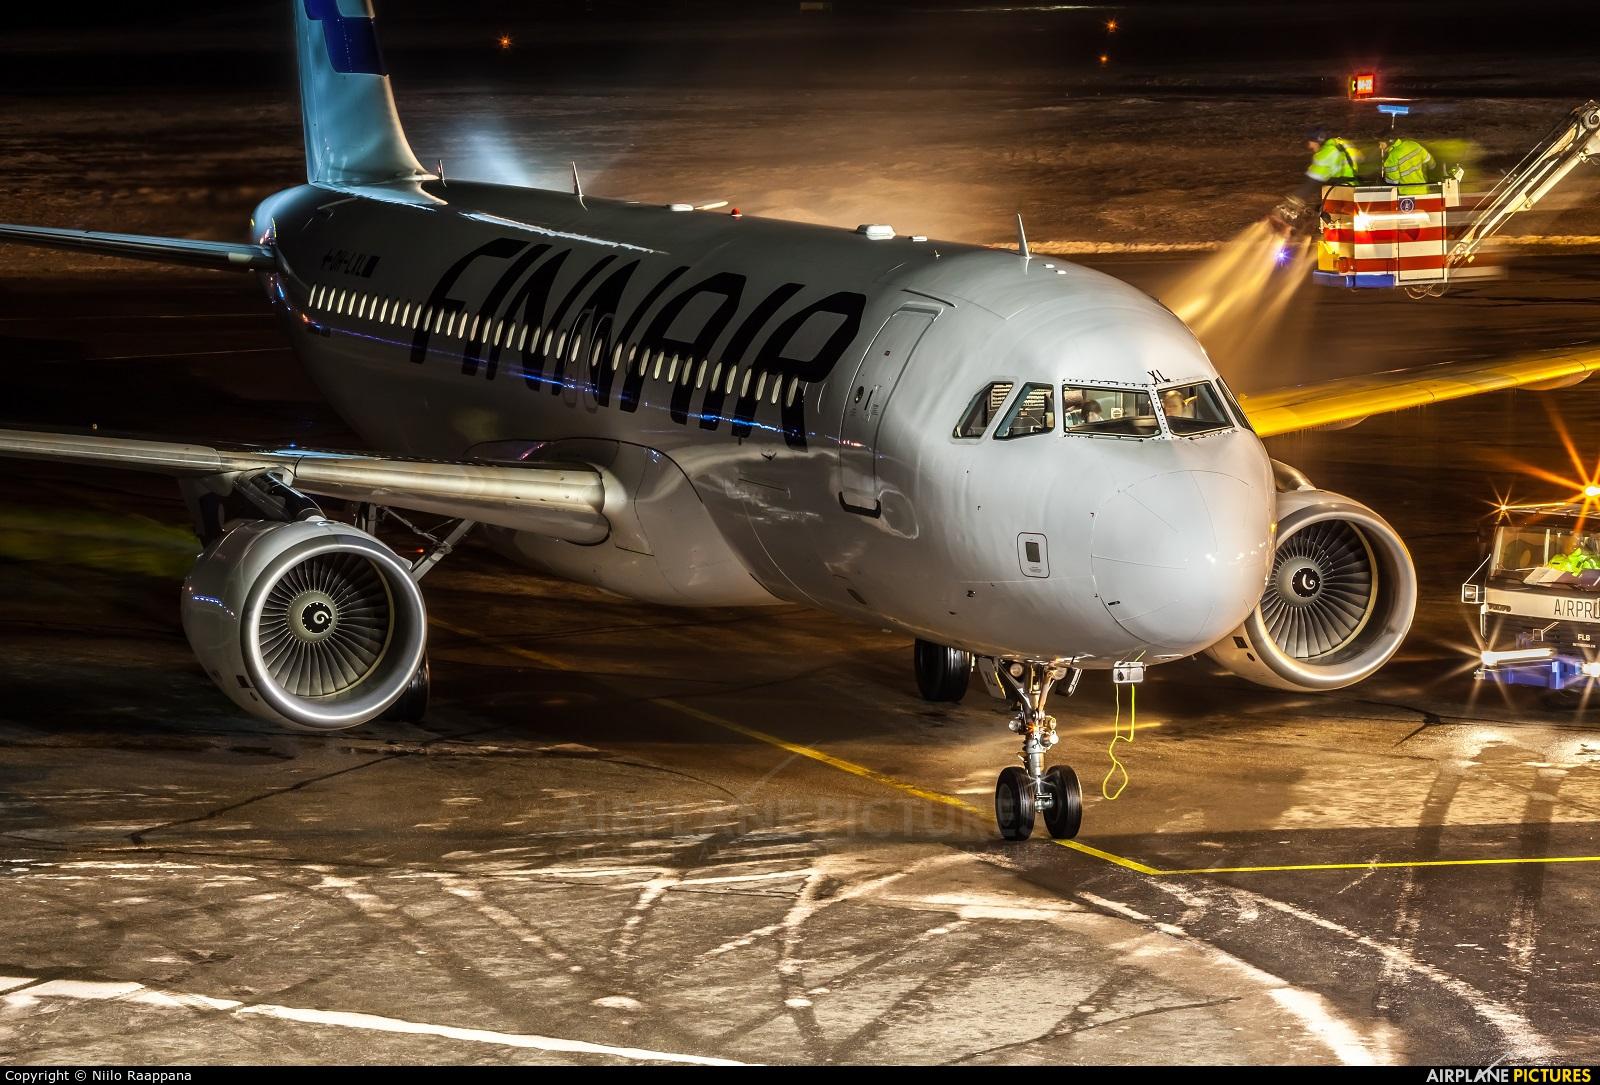 Finnair OH-LXL aircraft at Ivalo Airport